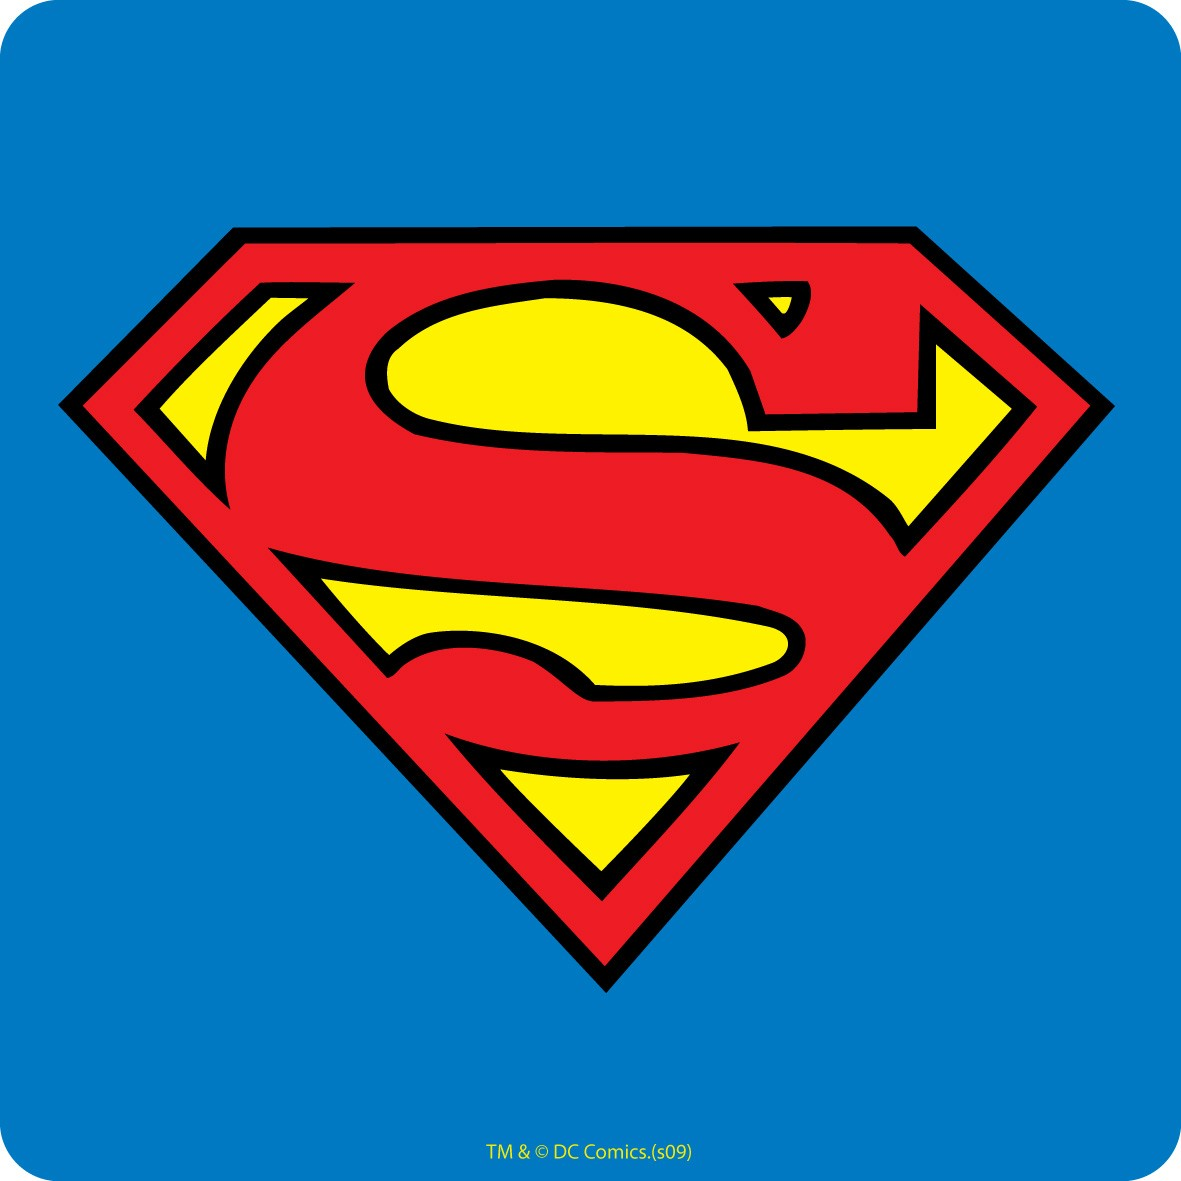 u_20260840_Half Moon Bay_Homewares_Coasters_coaster-superman-logo.JPG